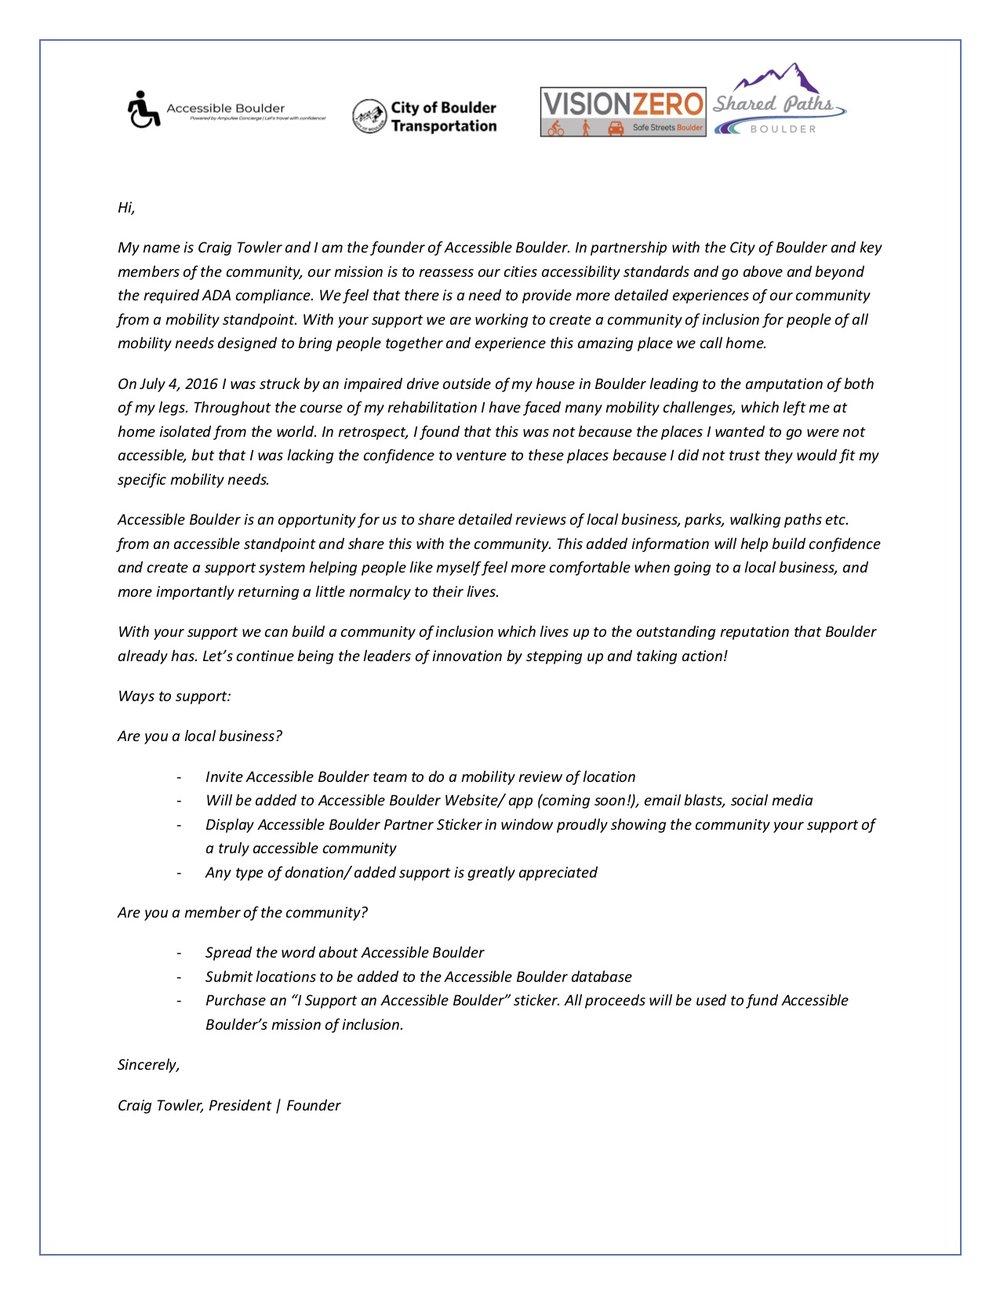 AB Intro Letter Draft 3.jpg